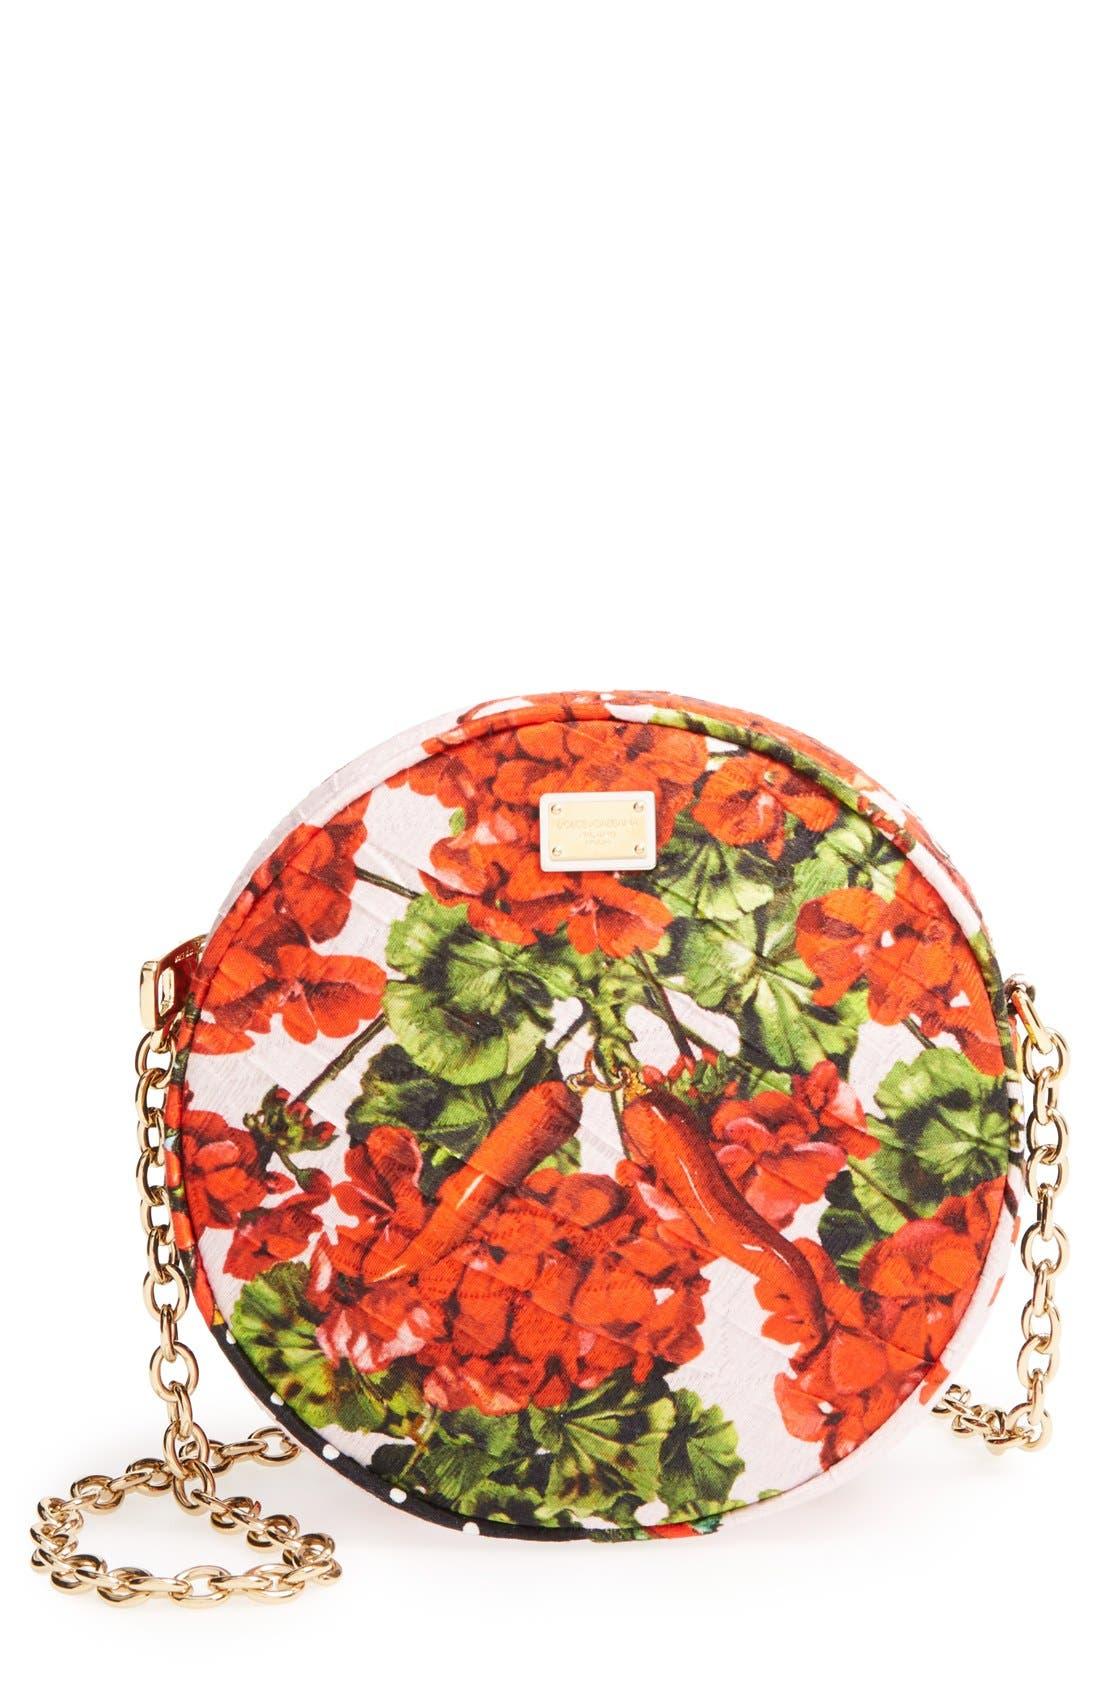 Main Image - Dolce&Gabbana 'Miss Glam' Floral Print Crossbody Bag